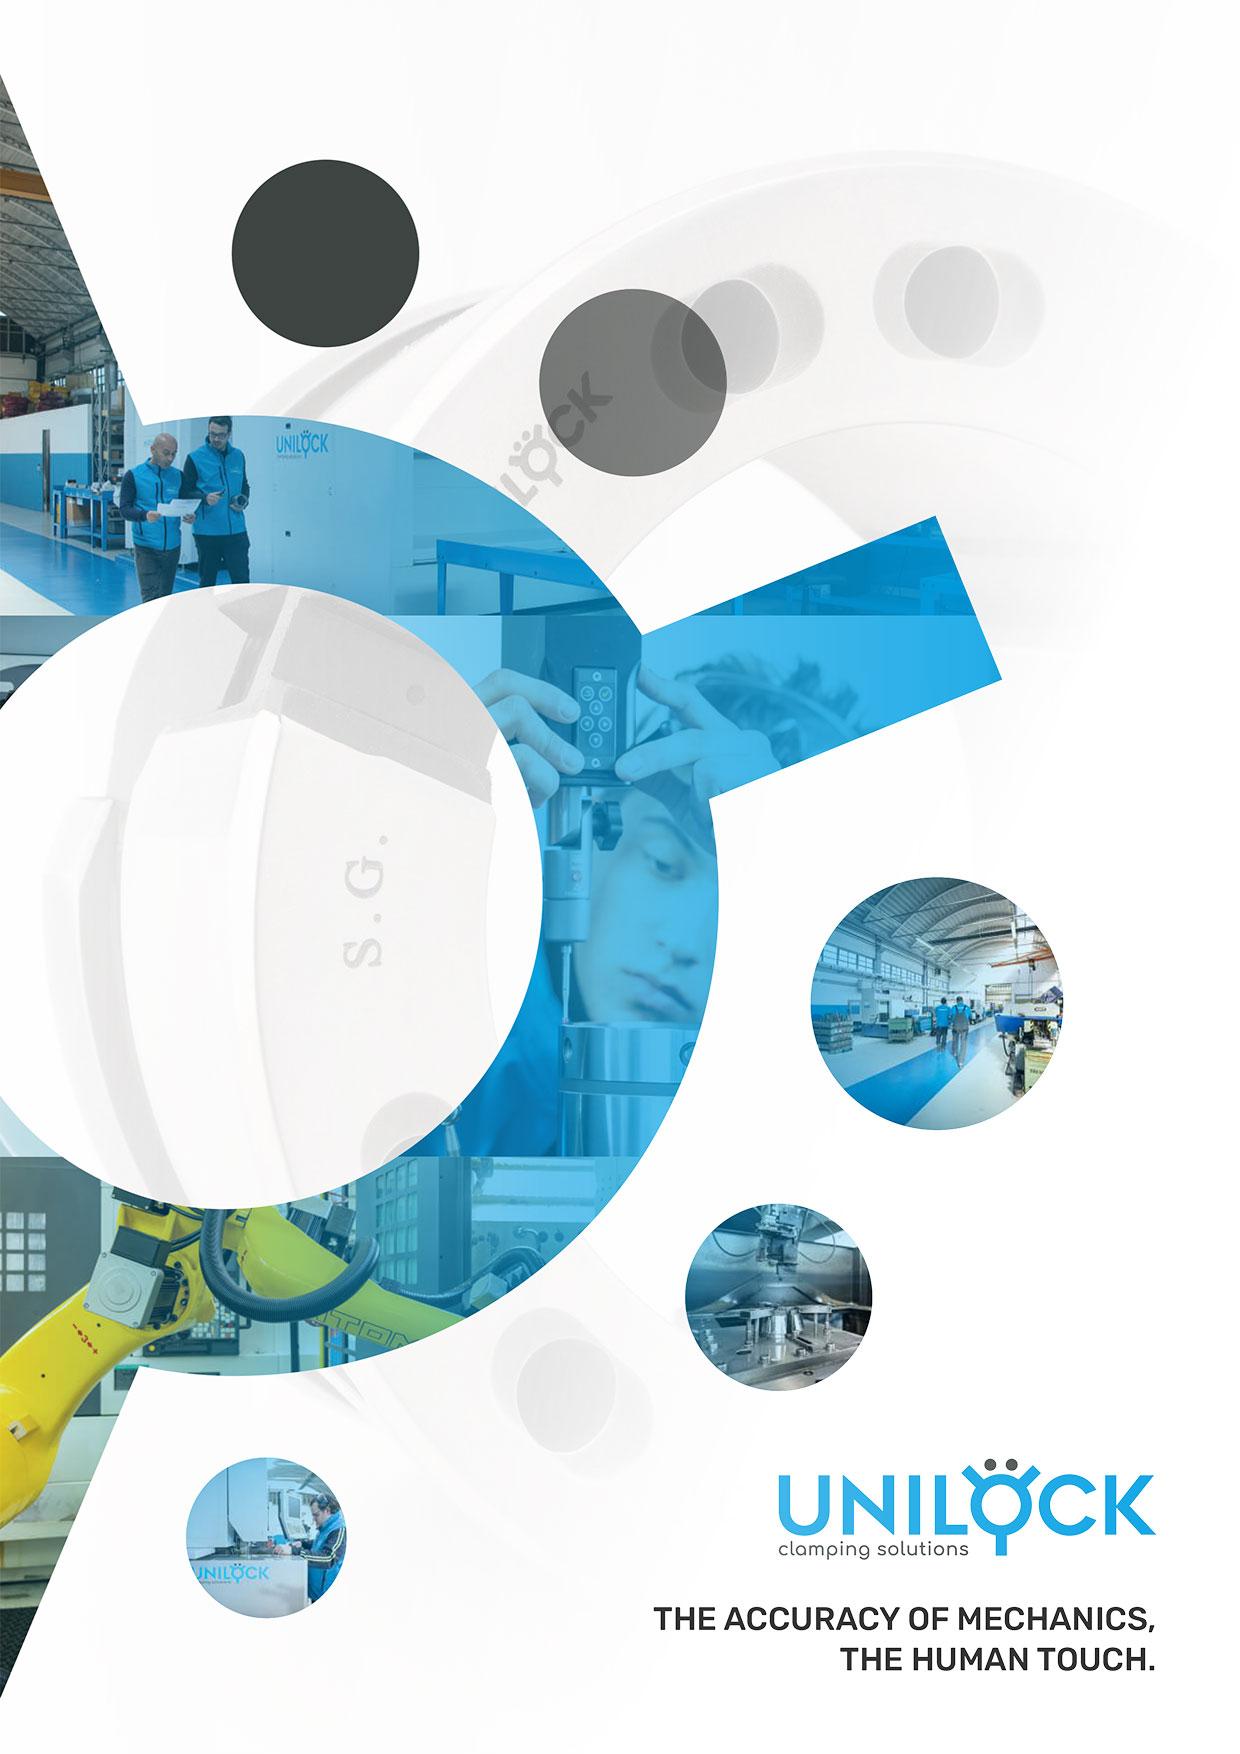 Unilock Clamping Solutions - Company Profile